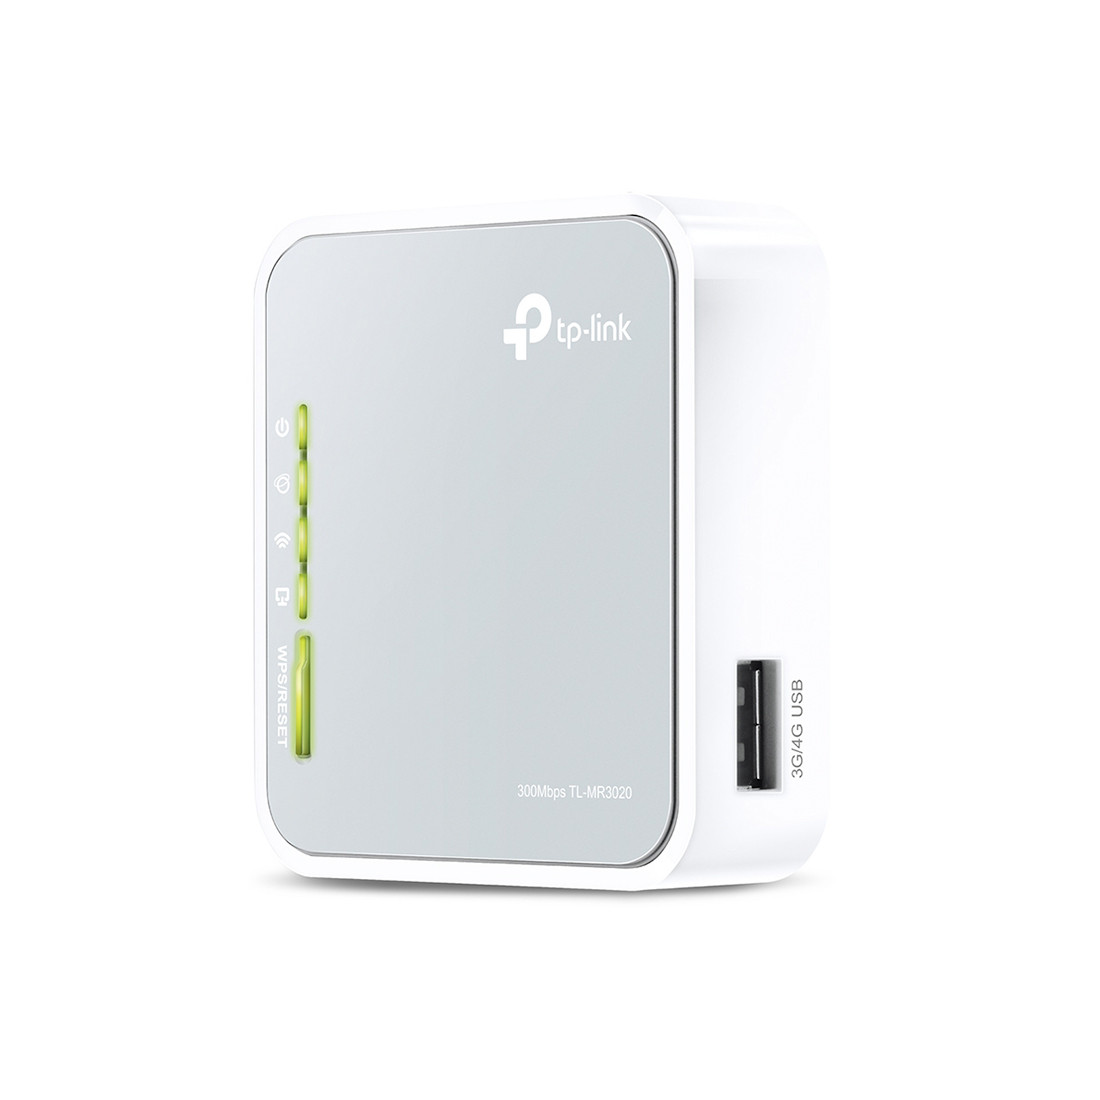 Маршрутизатор 3G/4G Портативный TP-Link TL-MR3020